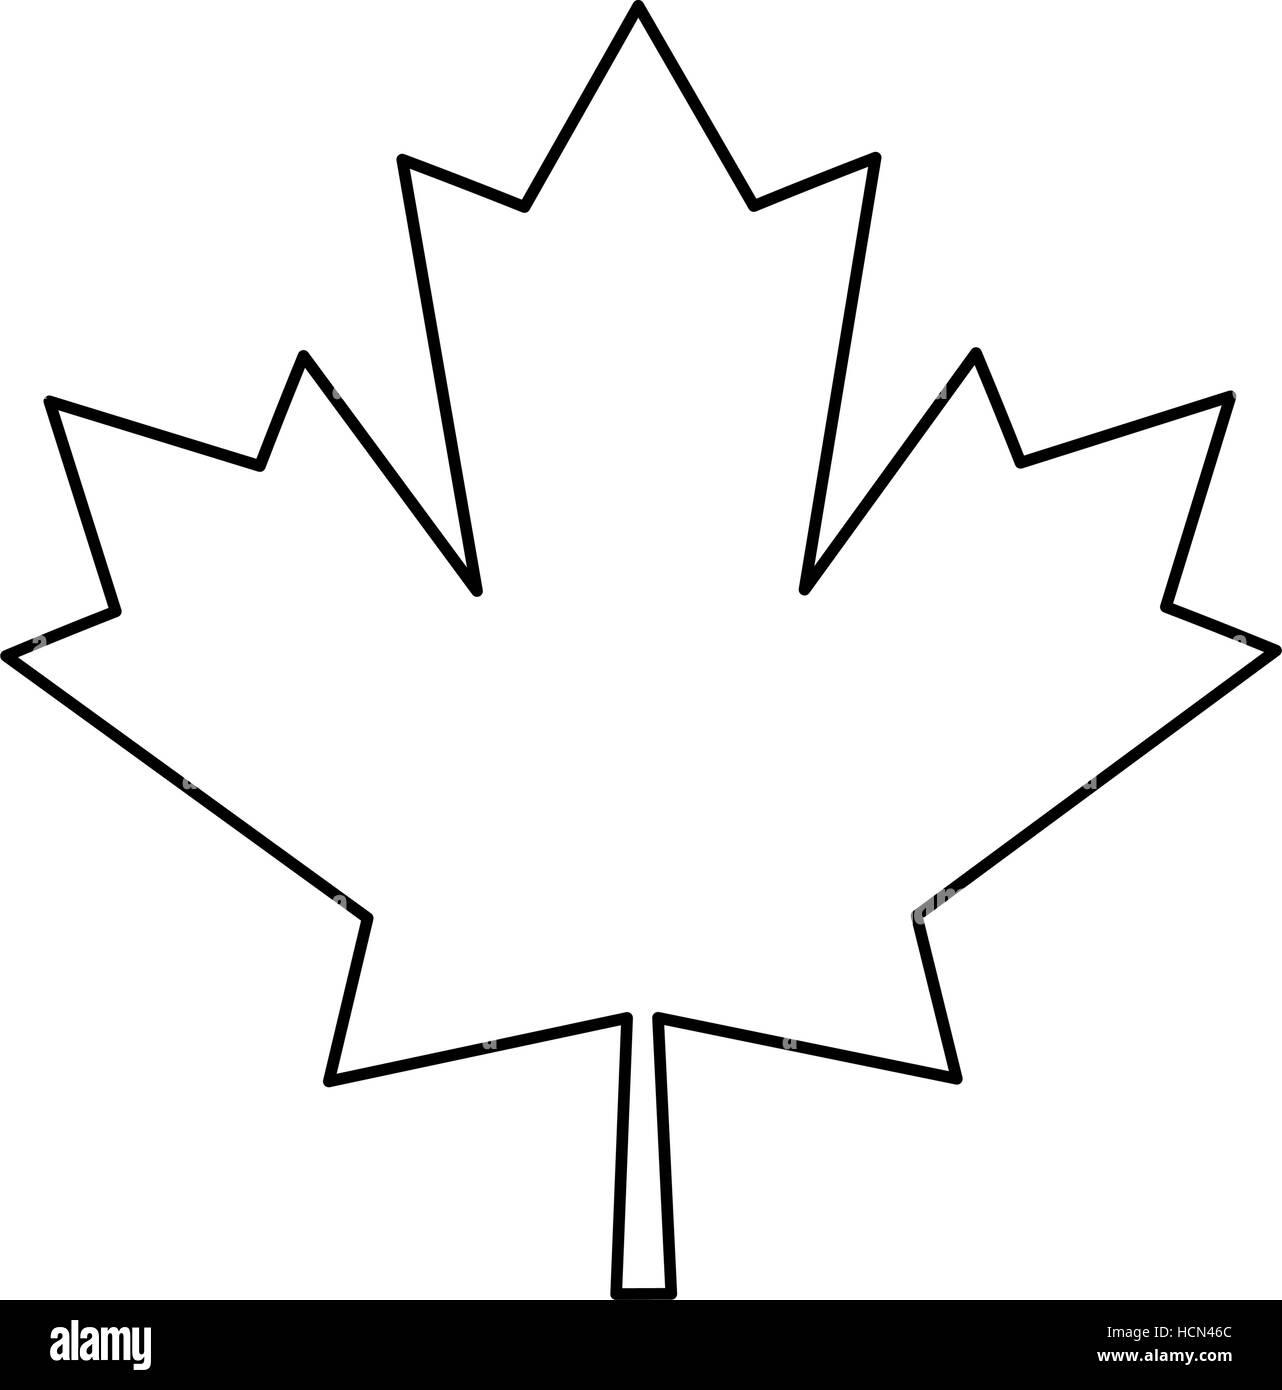 Maple Leaf Green Sign Canadian Outline Stock Vector Art